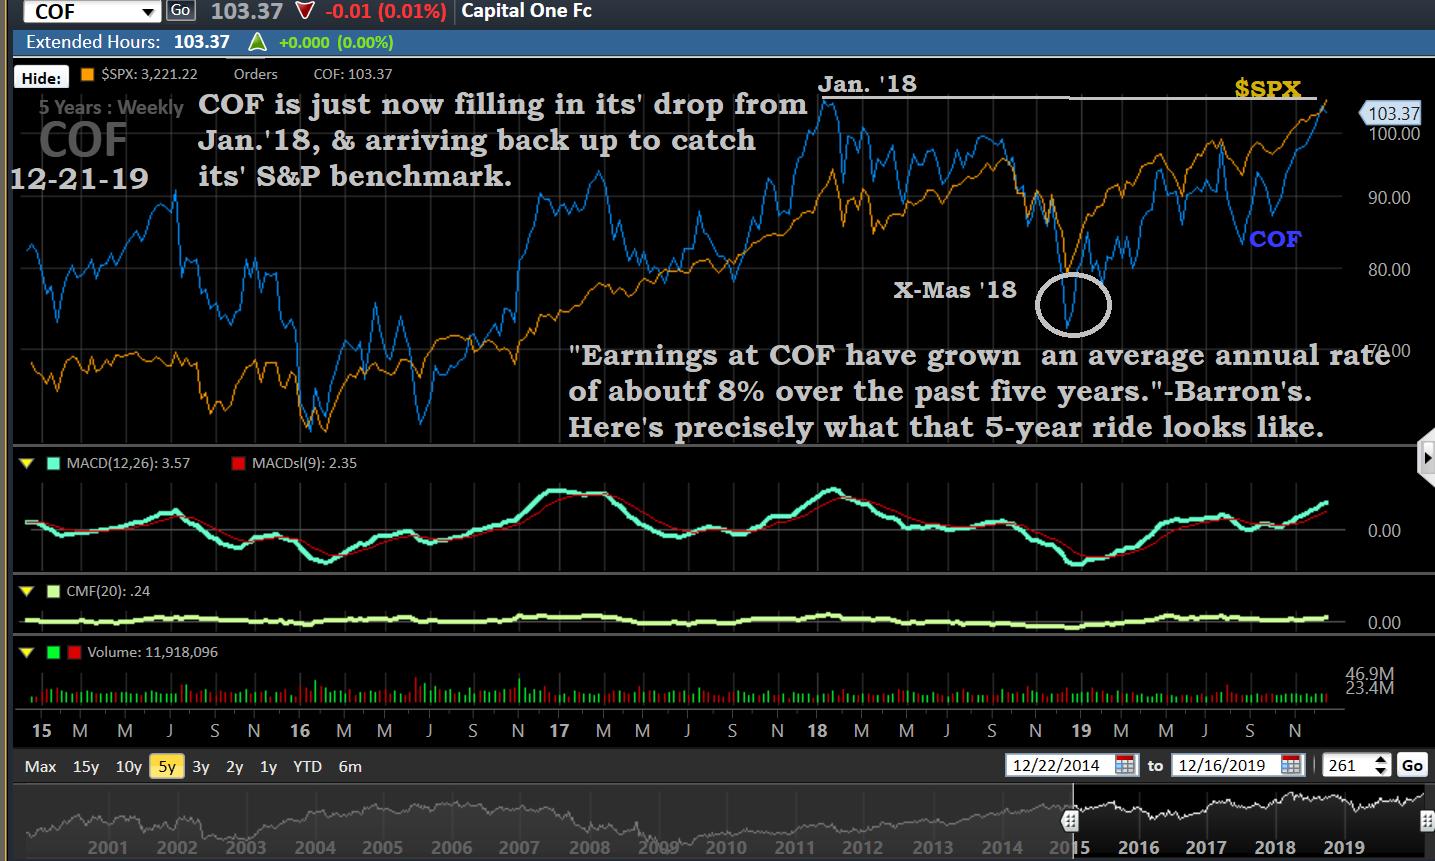 Capital one, chart 12-21-19